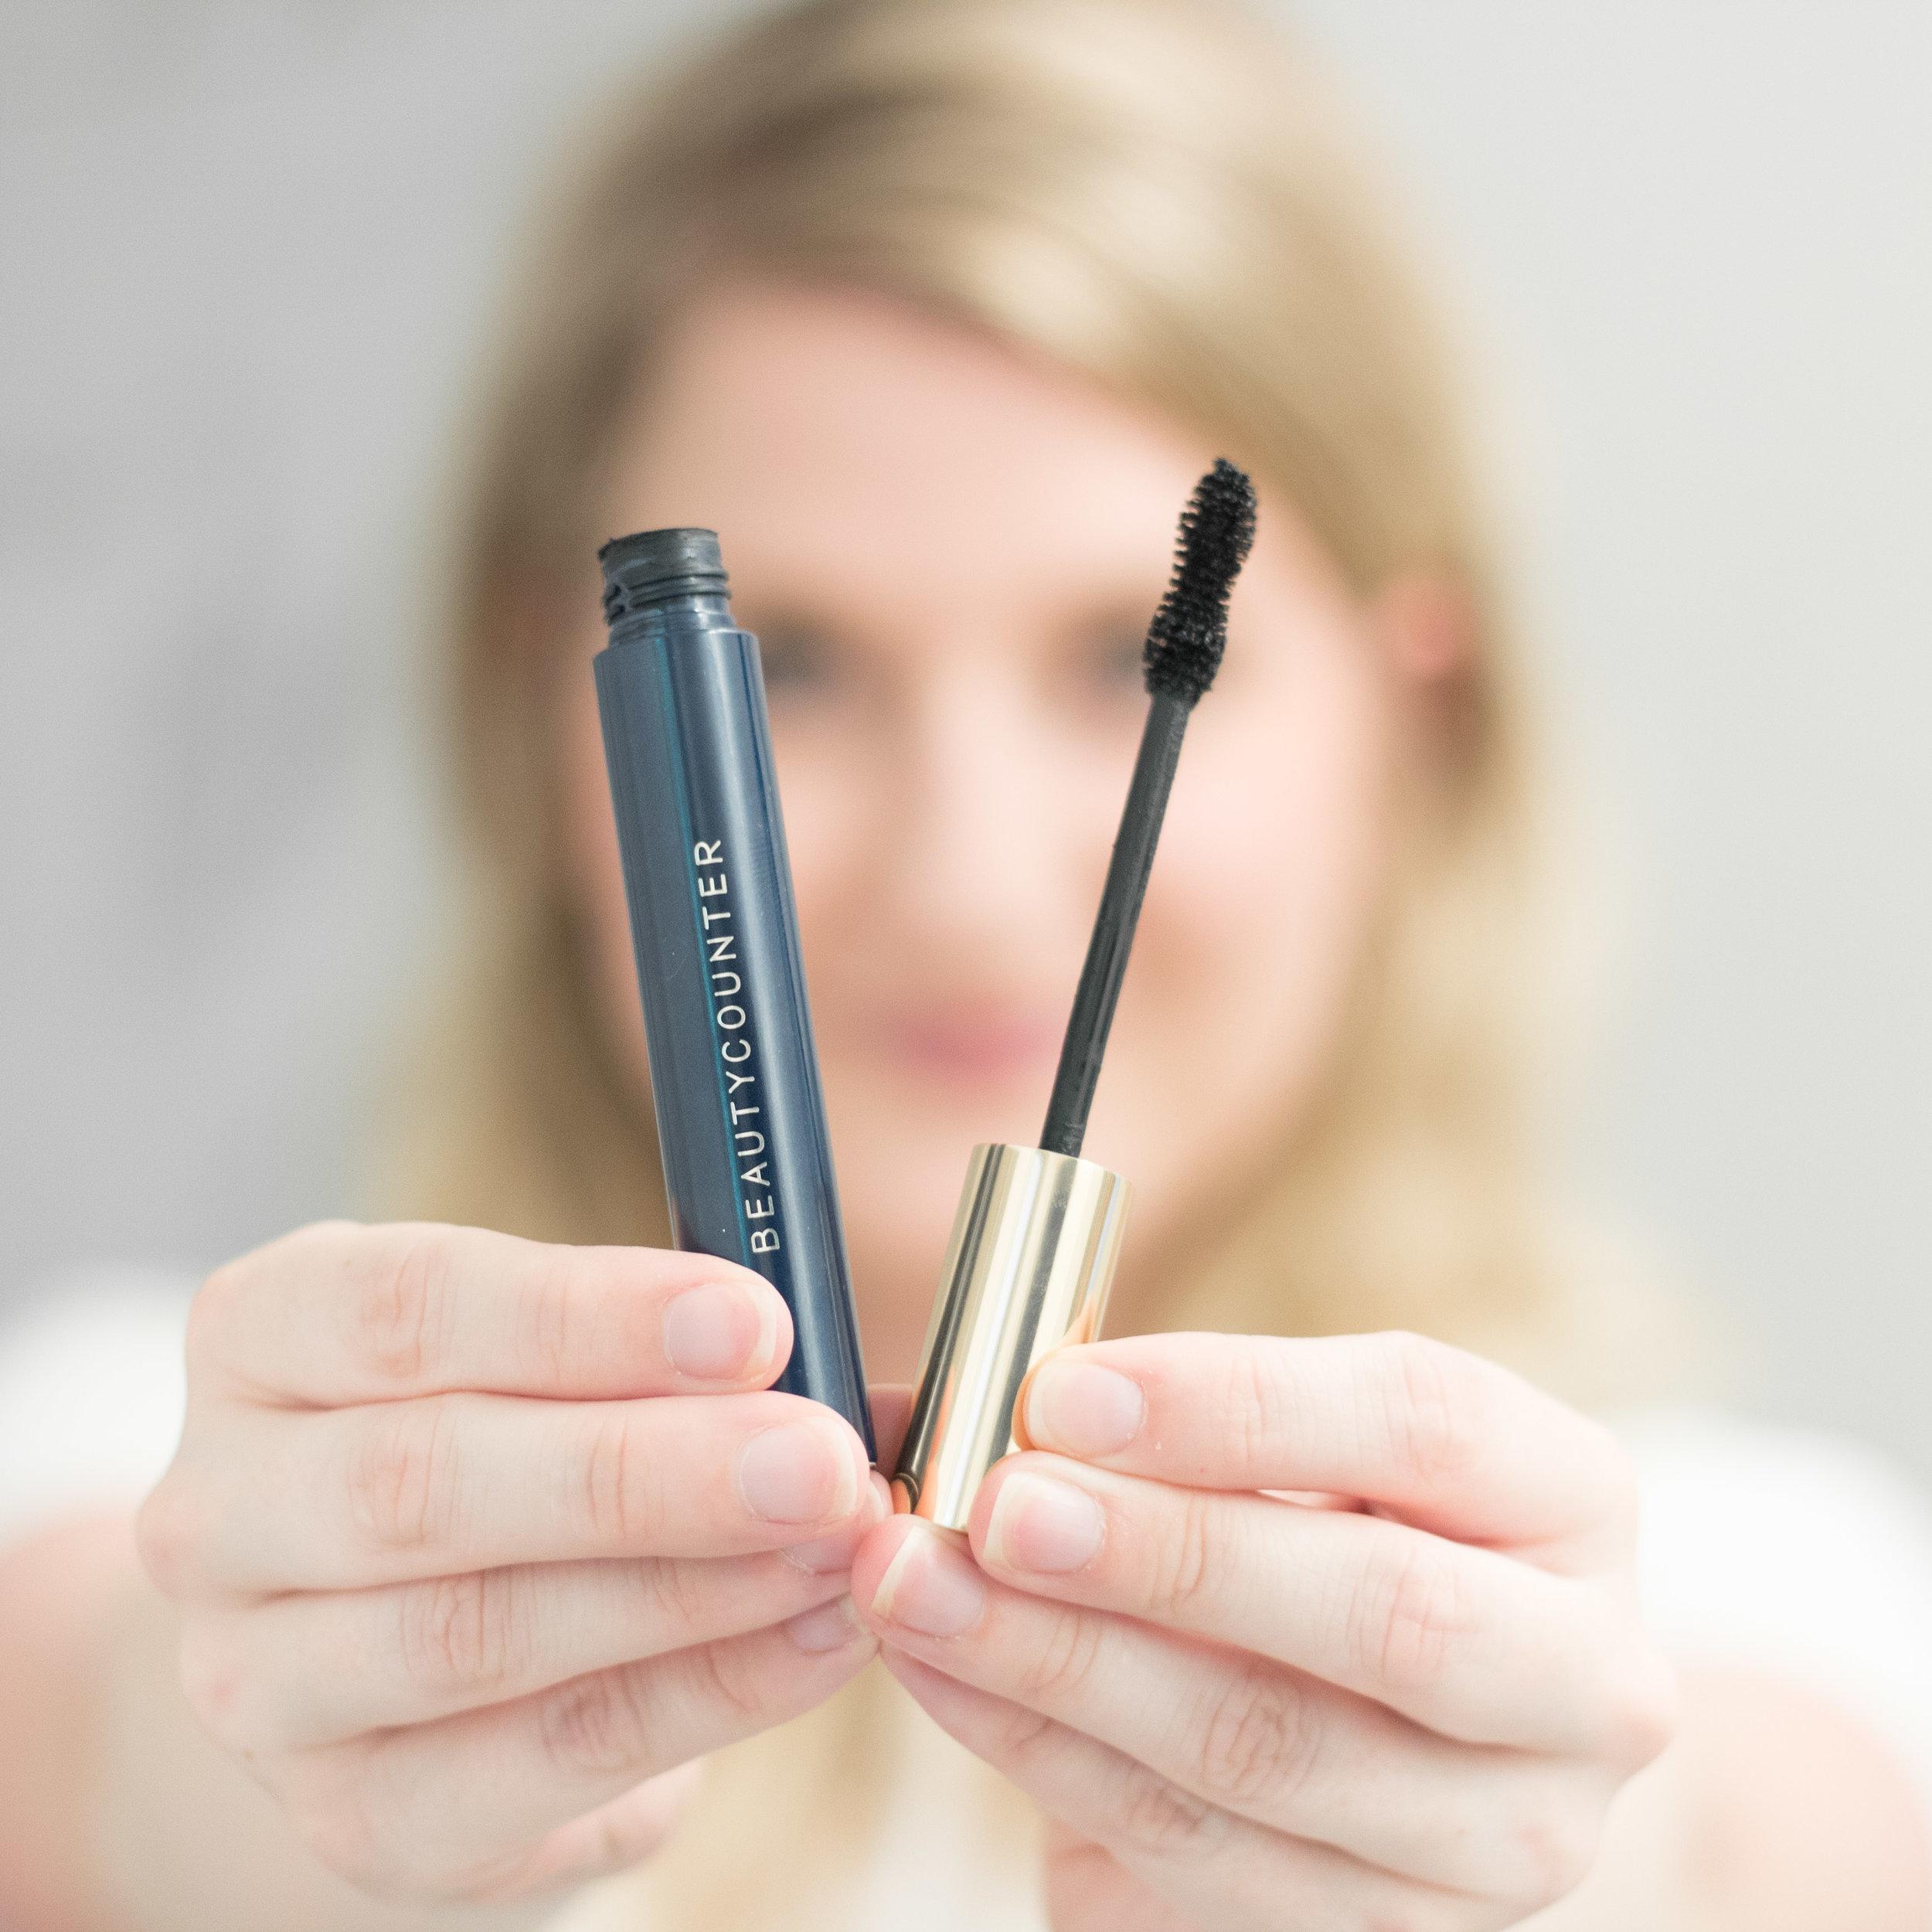 Beauty Counter's Flawless in Five Volumizing Mascara